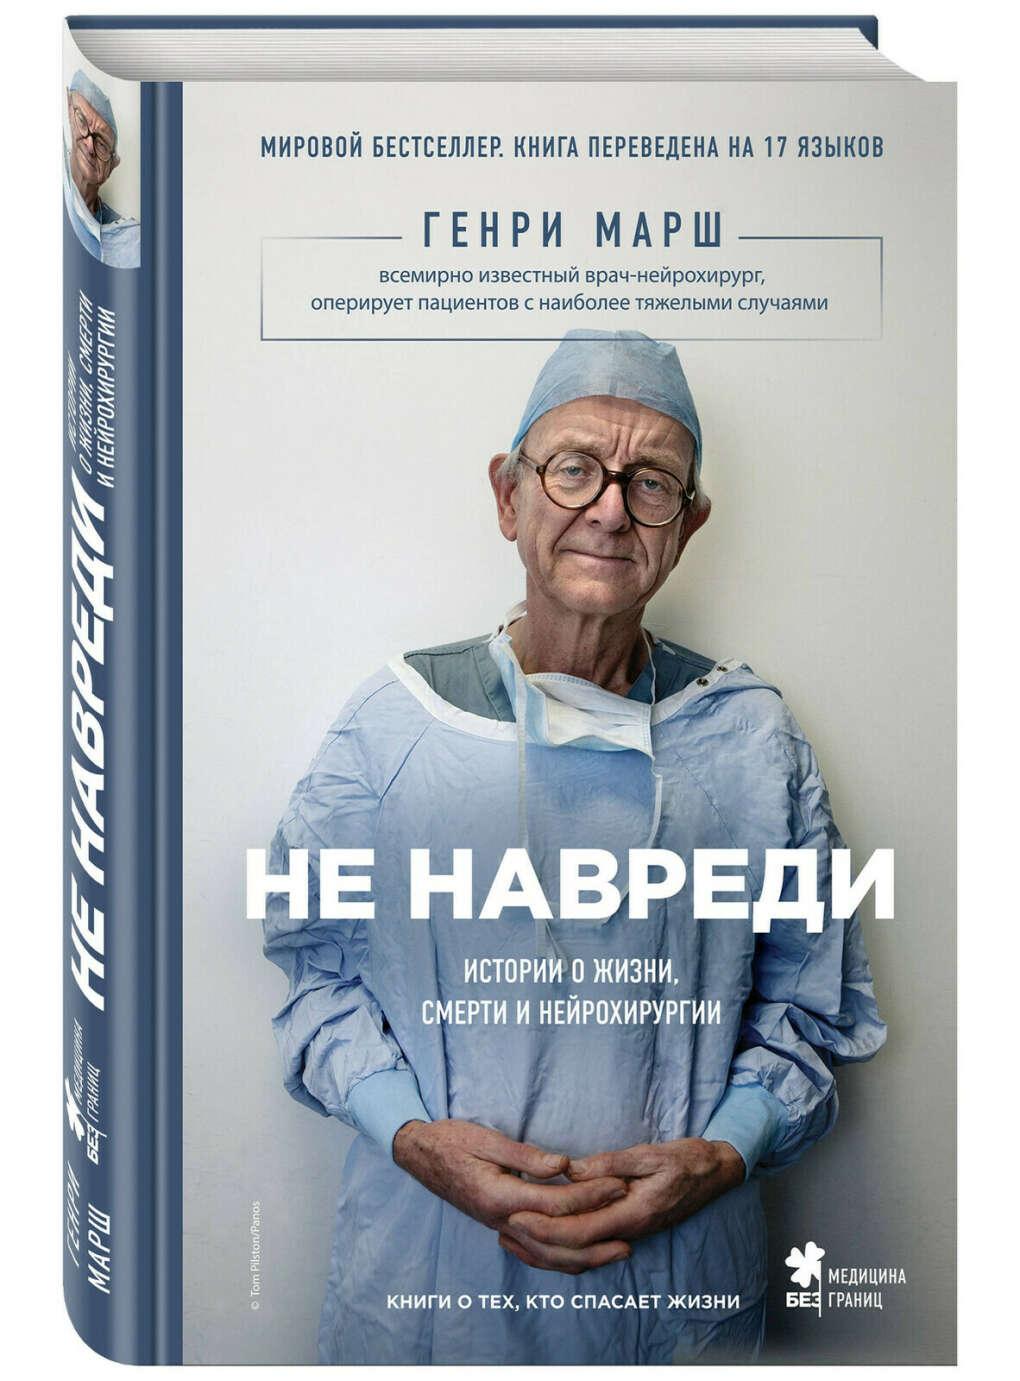 Не навреди. Истории о жизни, смерти и нейрохирургии / Do No Harm: Stories of Life, Death and Brain Surgery | Марш Генри